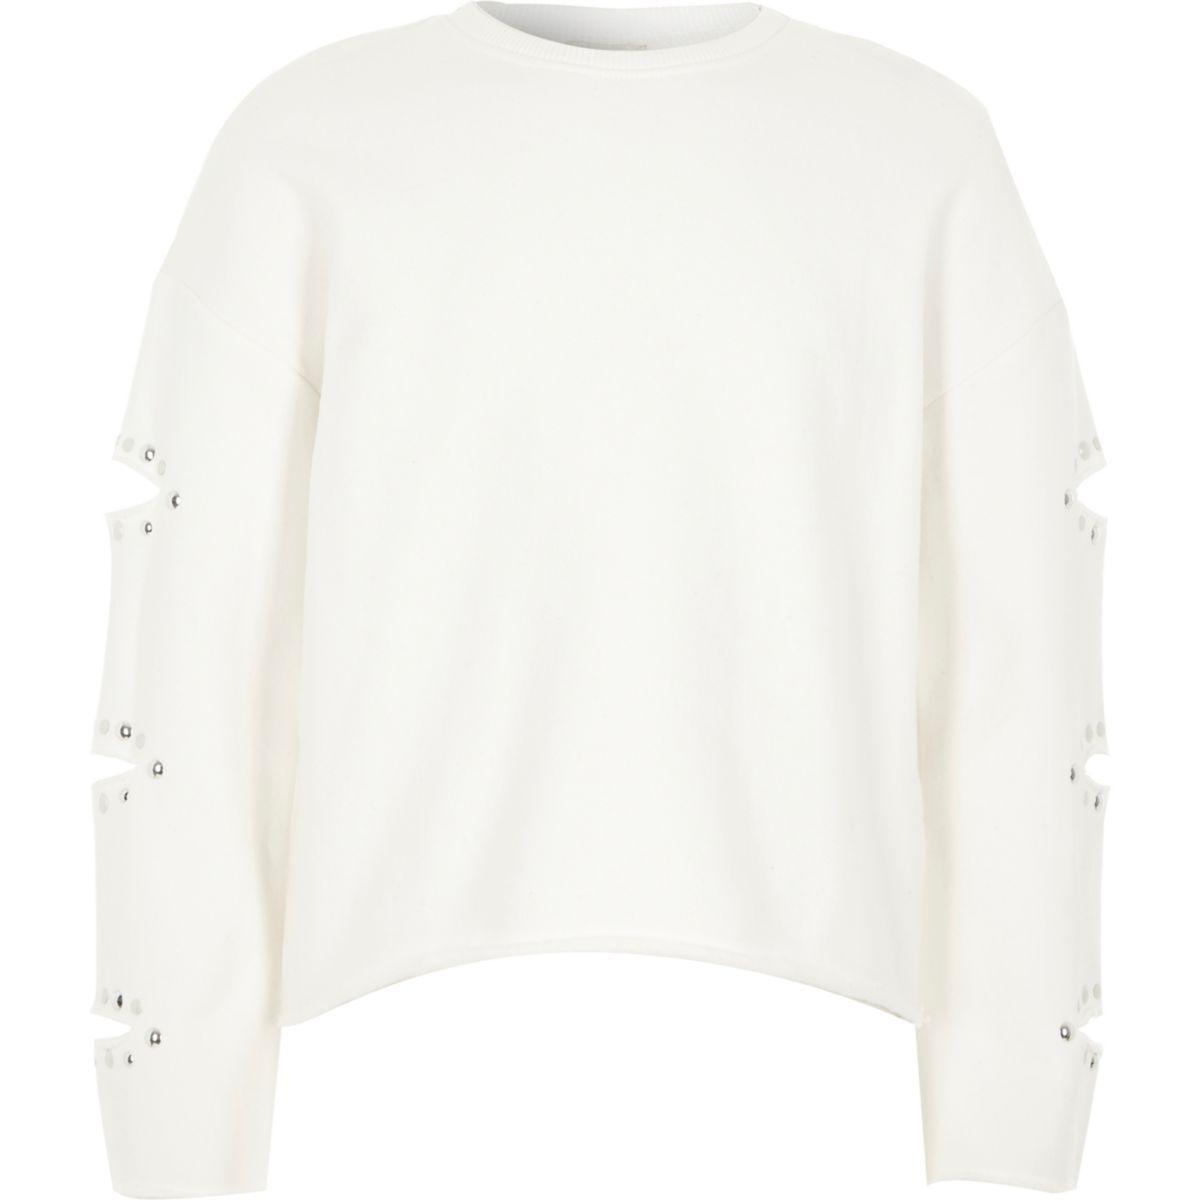 Girls white split sleeve heatseal sweatshirt